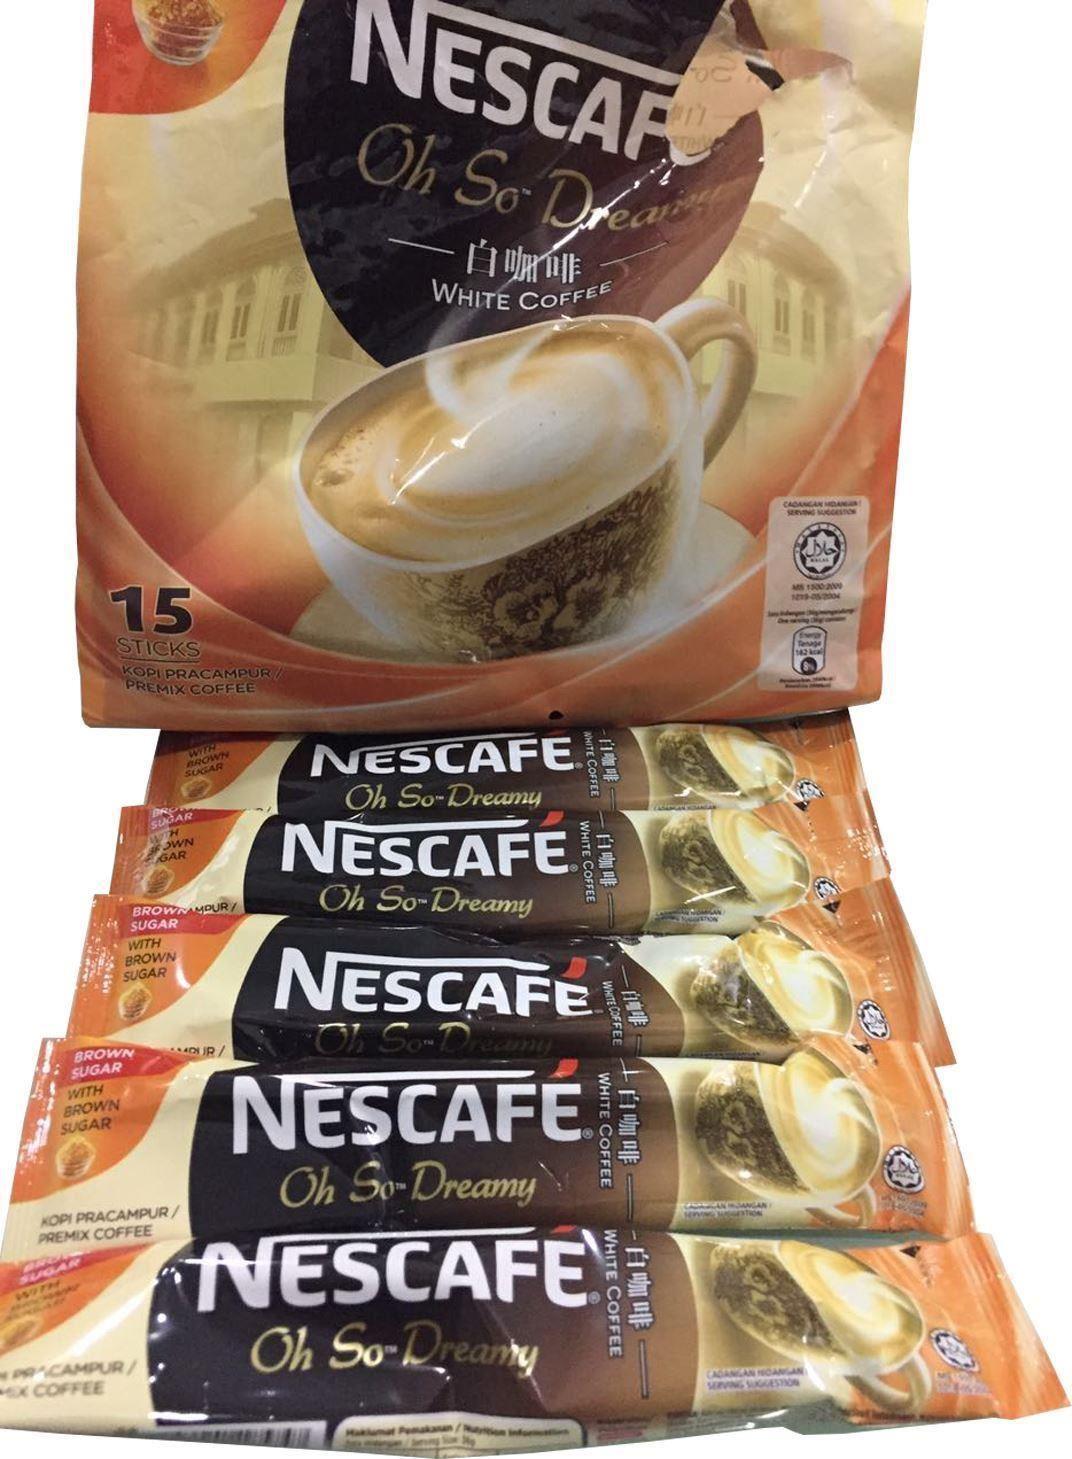 NESCAFÉ Oh So Dreamy White Coffee with Brown Sugar | eBay